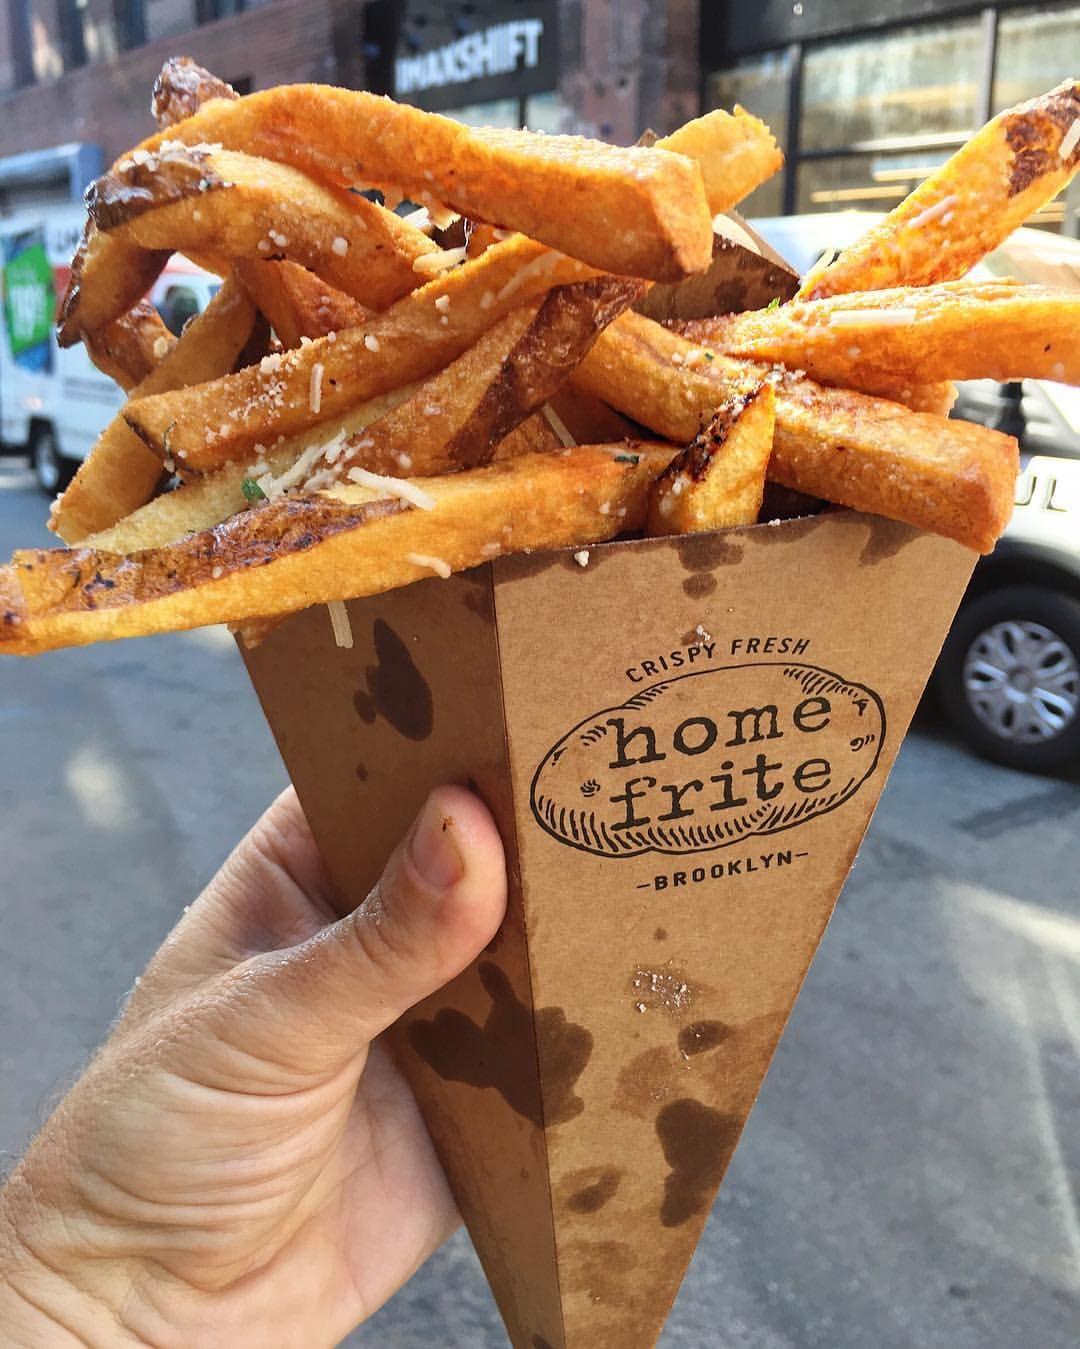 Home frites by @scottlipps #fries #smorgasburg @smorgasburg (at DUMBO Brooklyn…